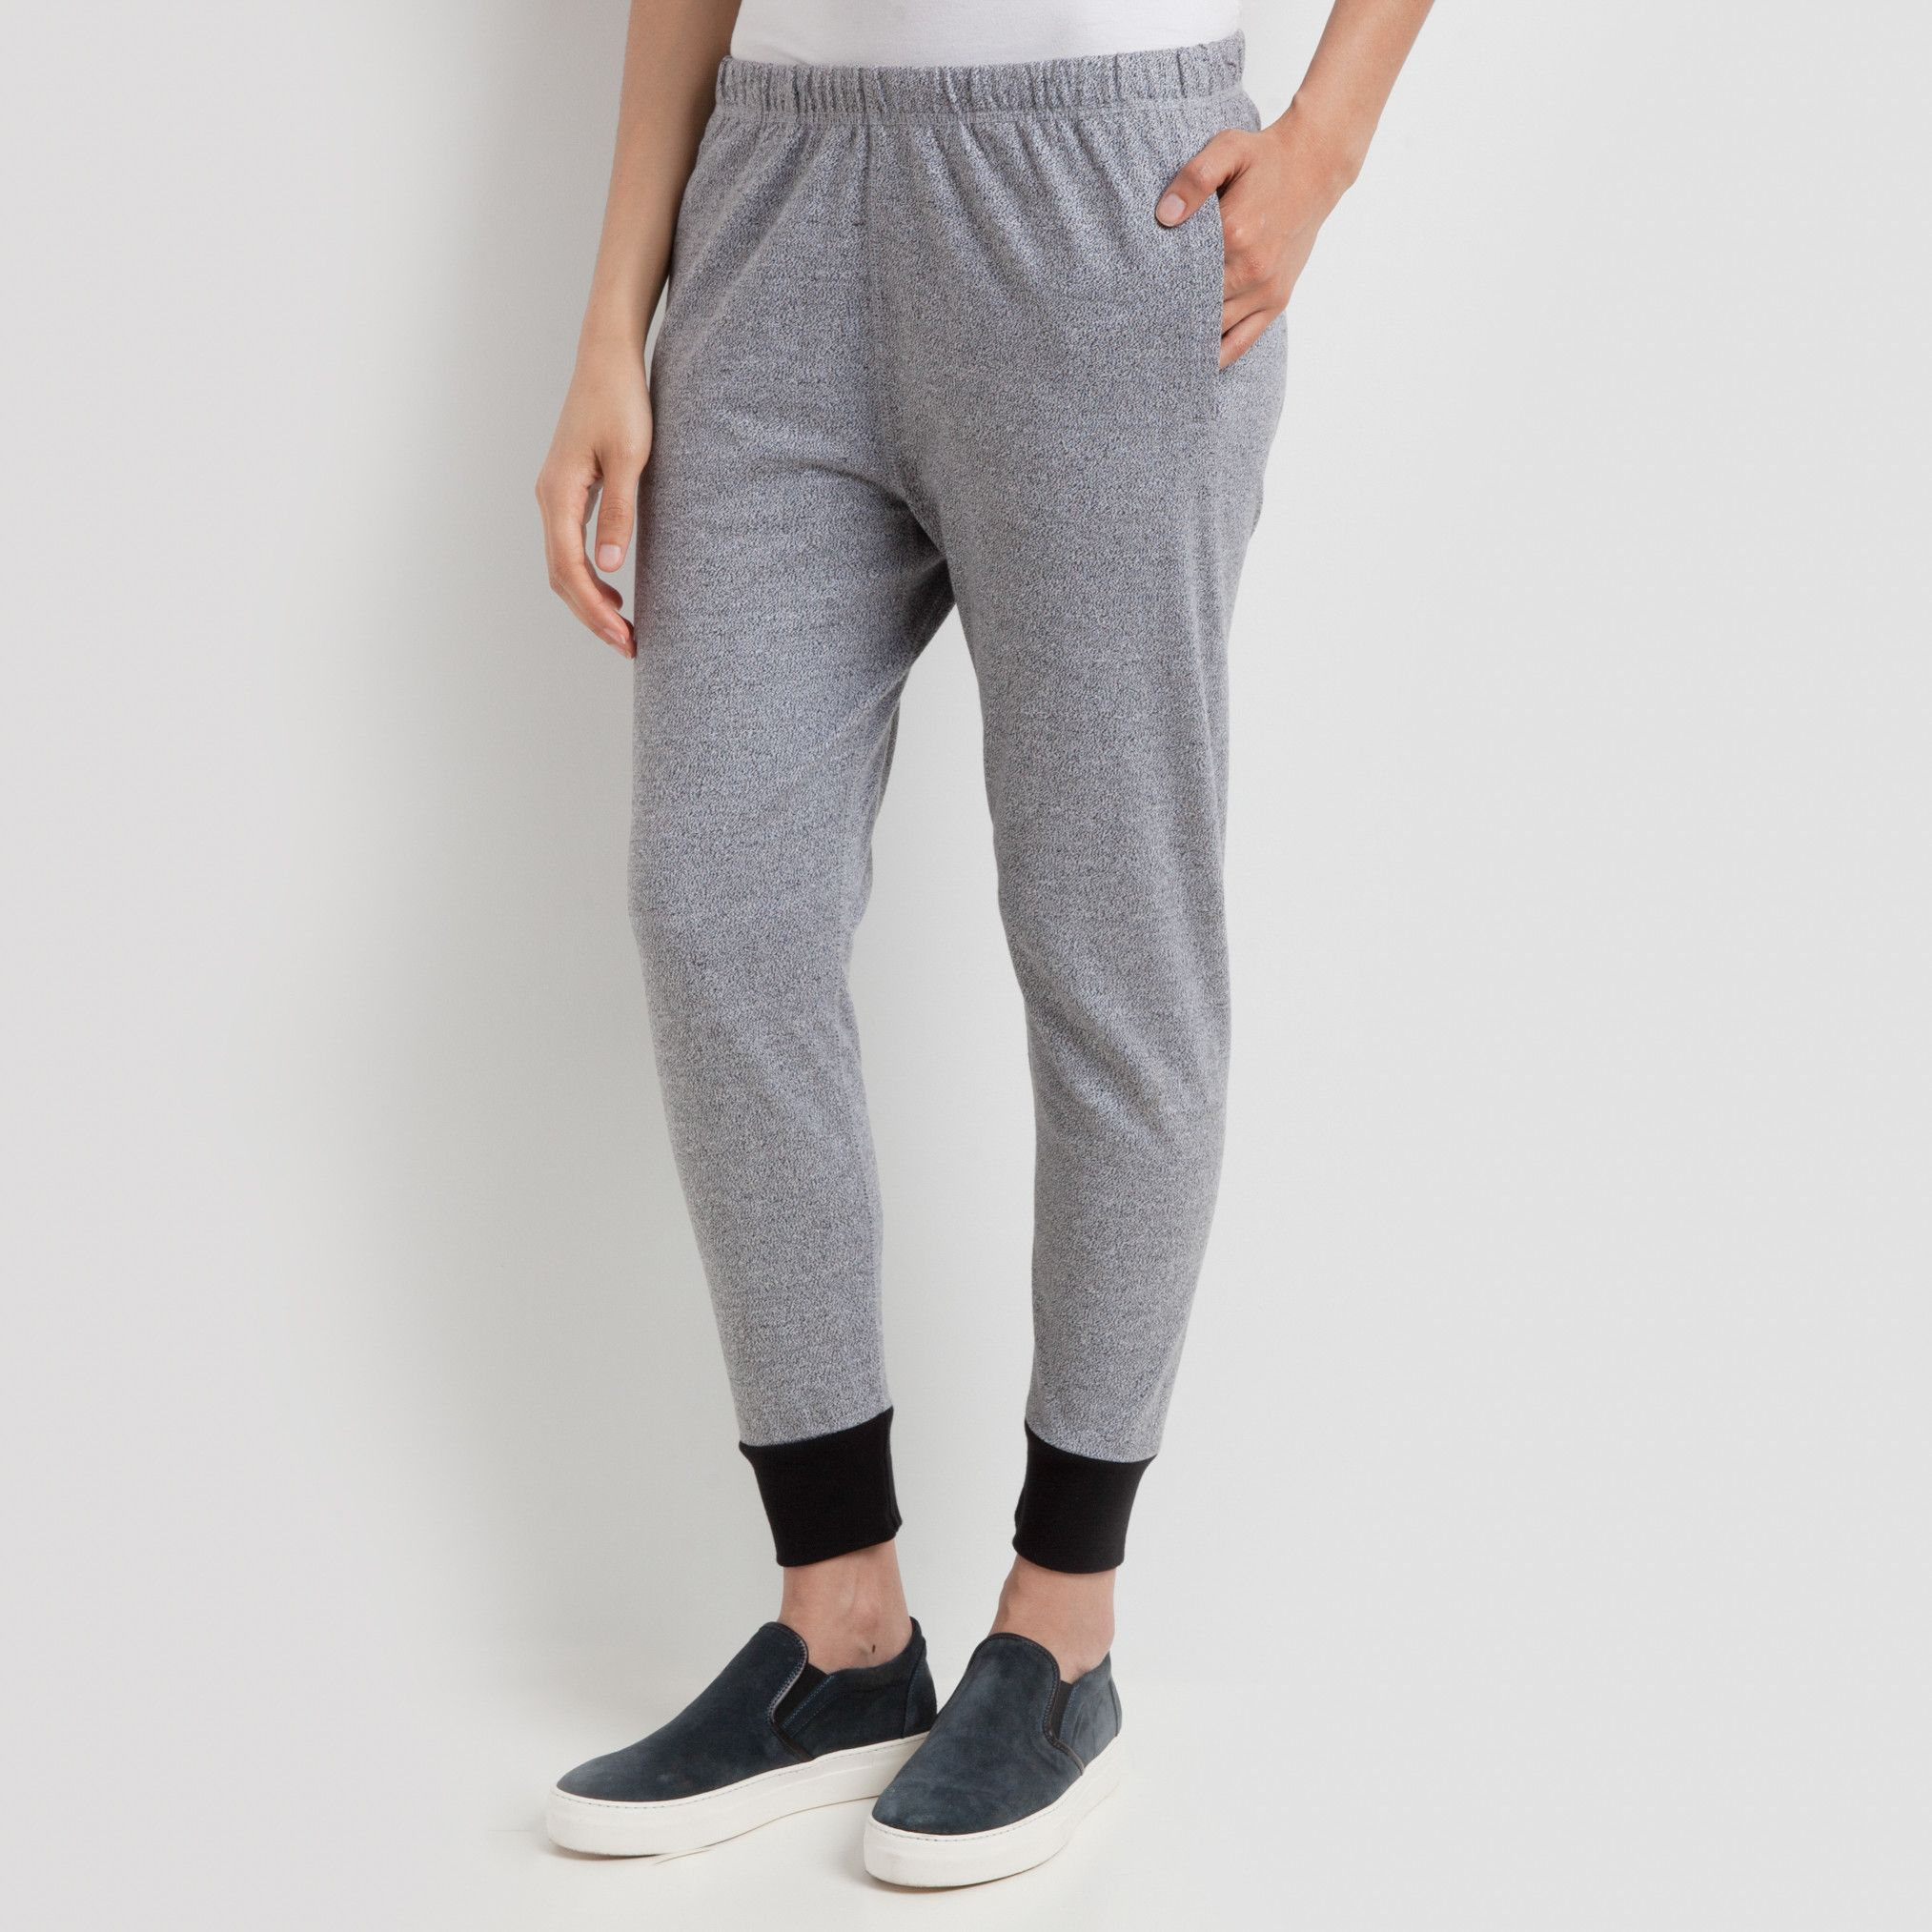 Cindy Slim Lodge Sweatpant | Roots Sweatpants for Women